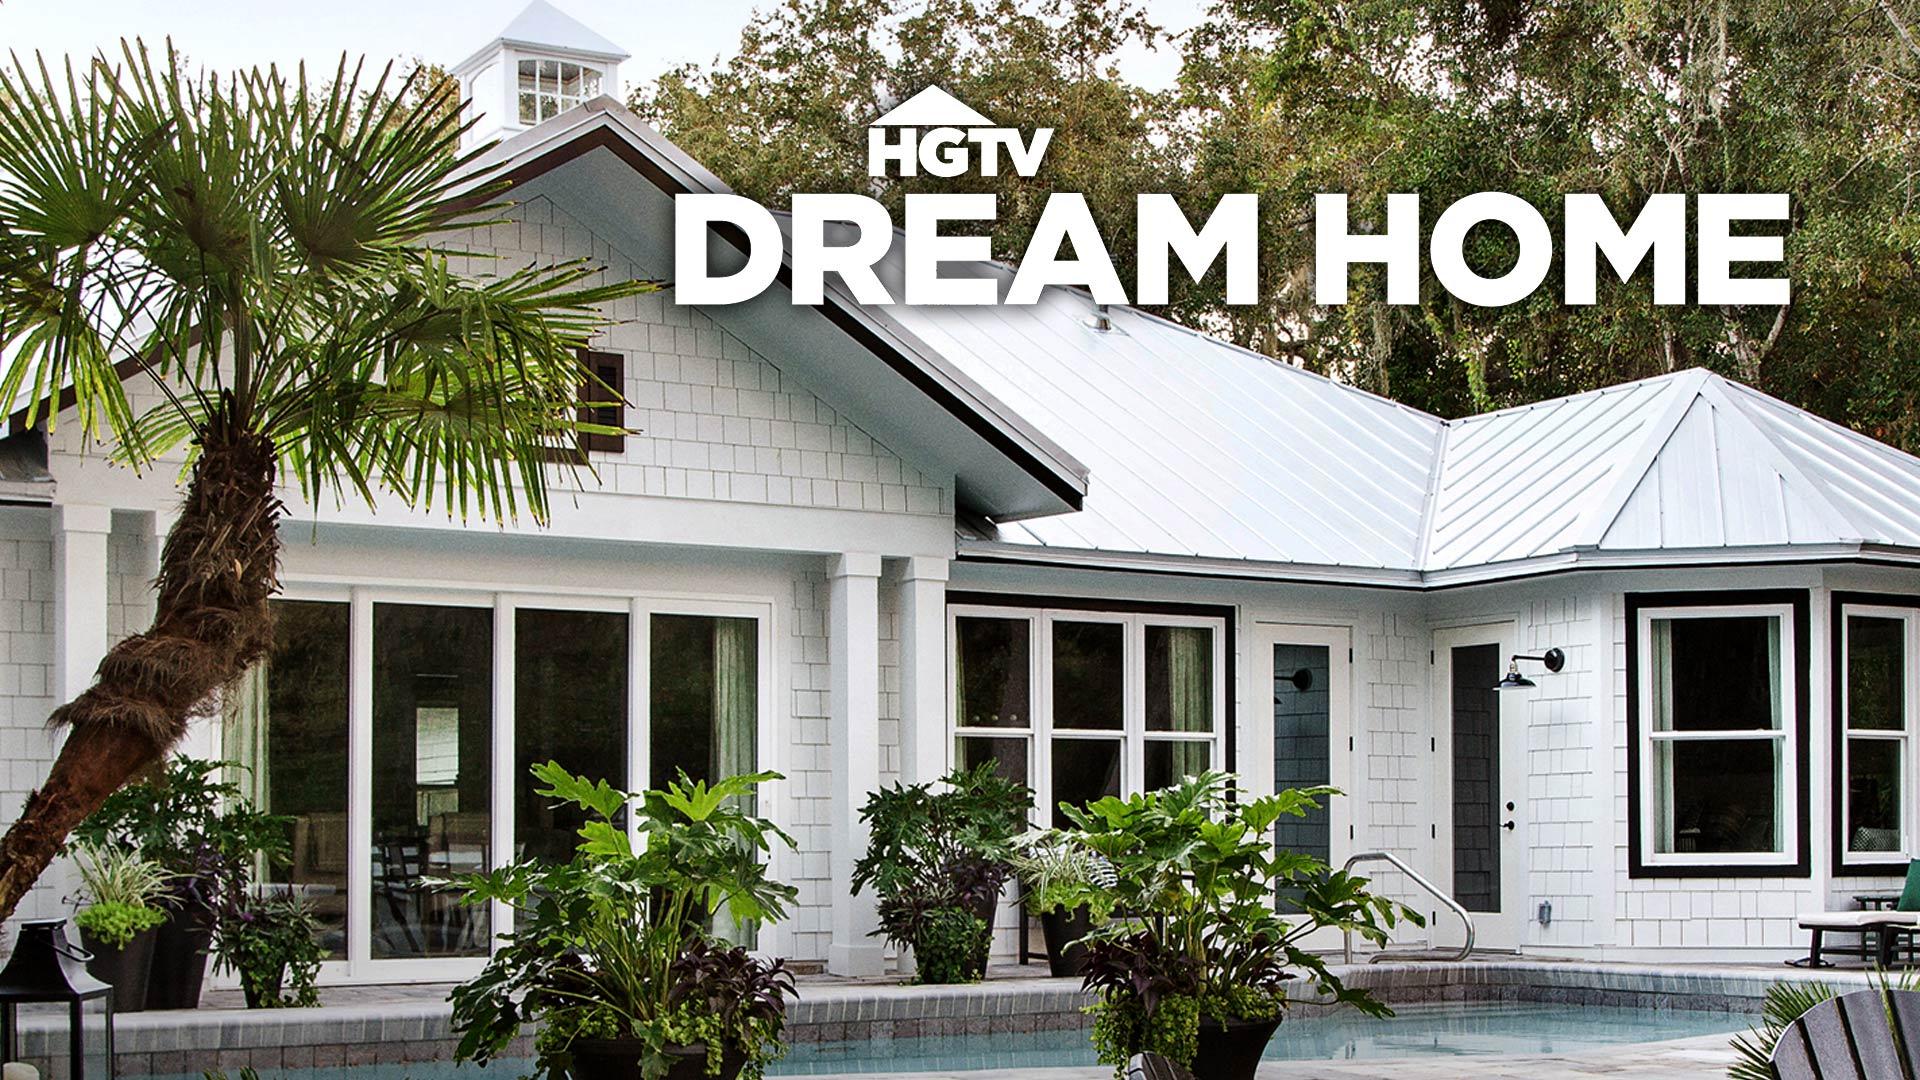 HGTV Dream Home, Season 14